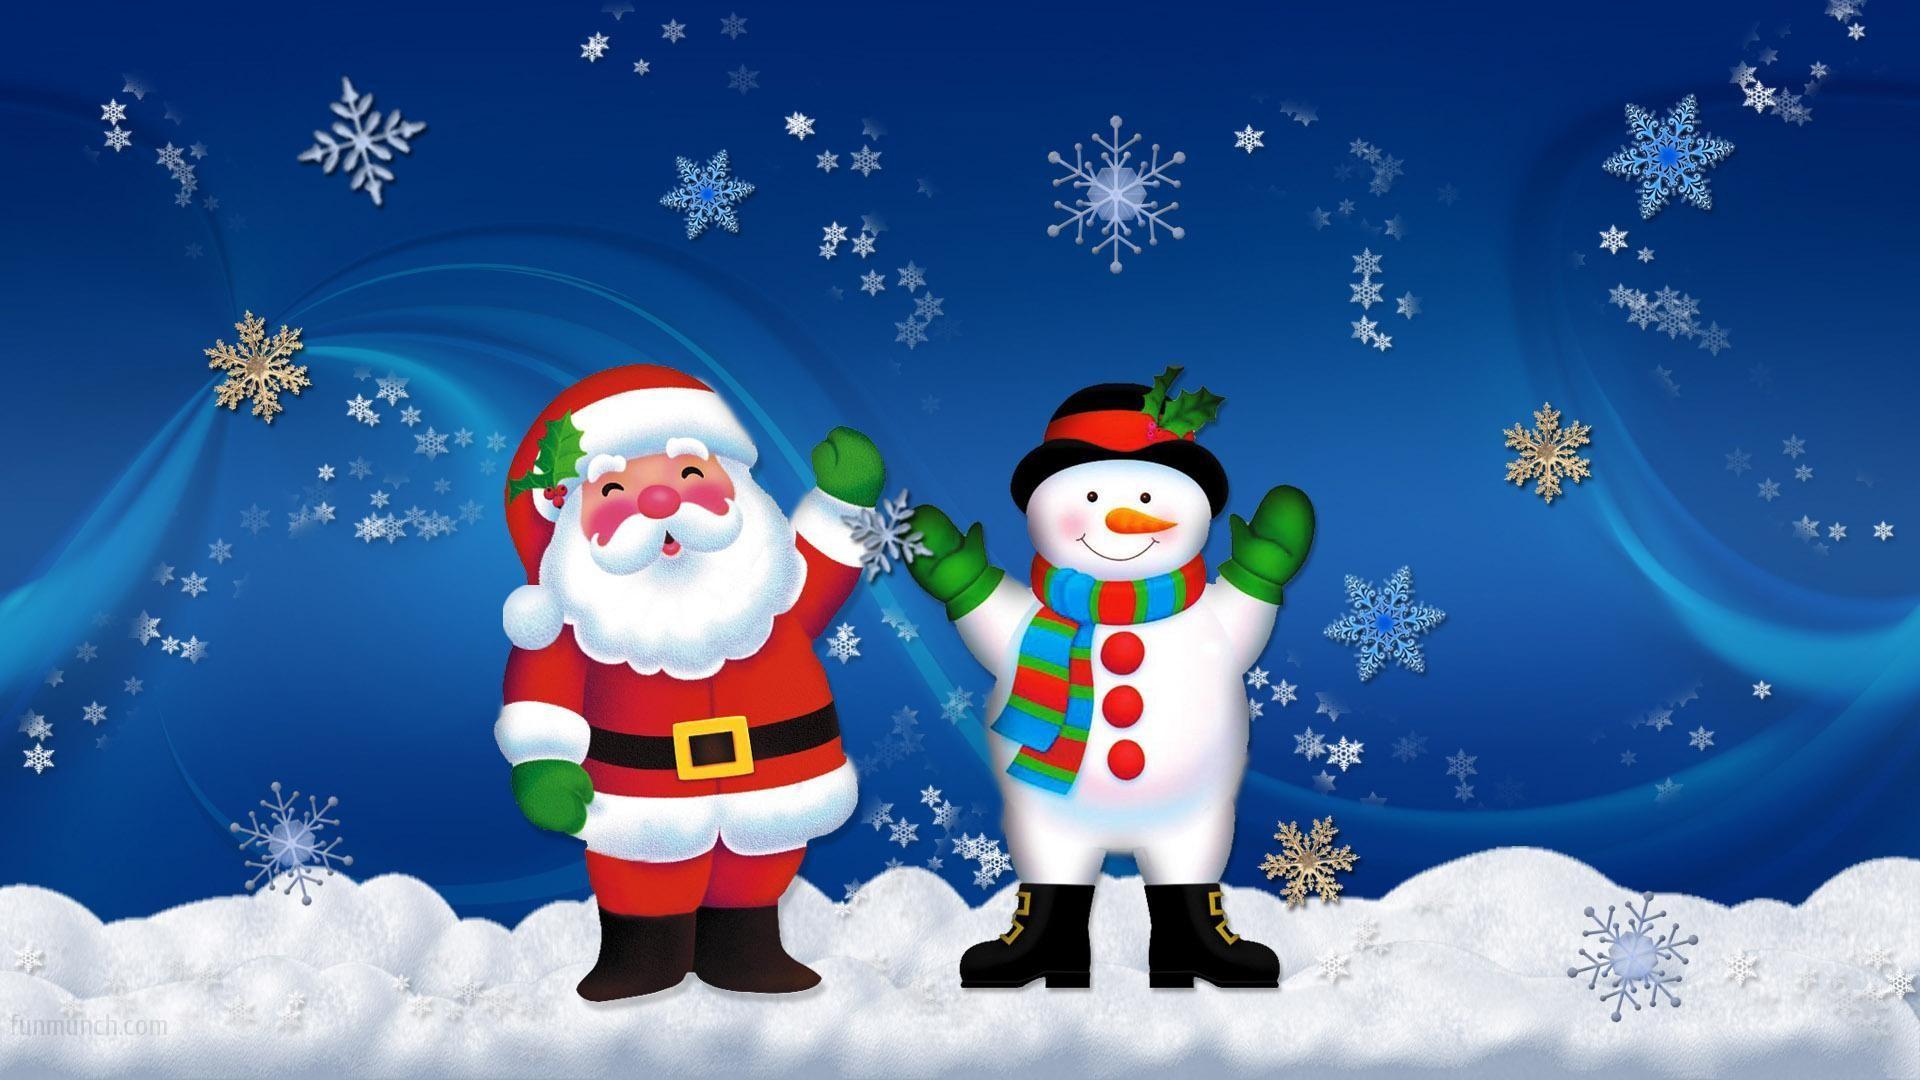 Res: 1920x1080, Animated Christmas Wallpaper